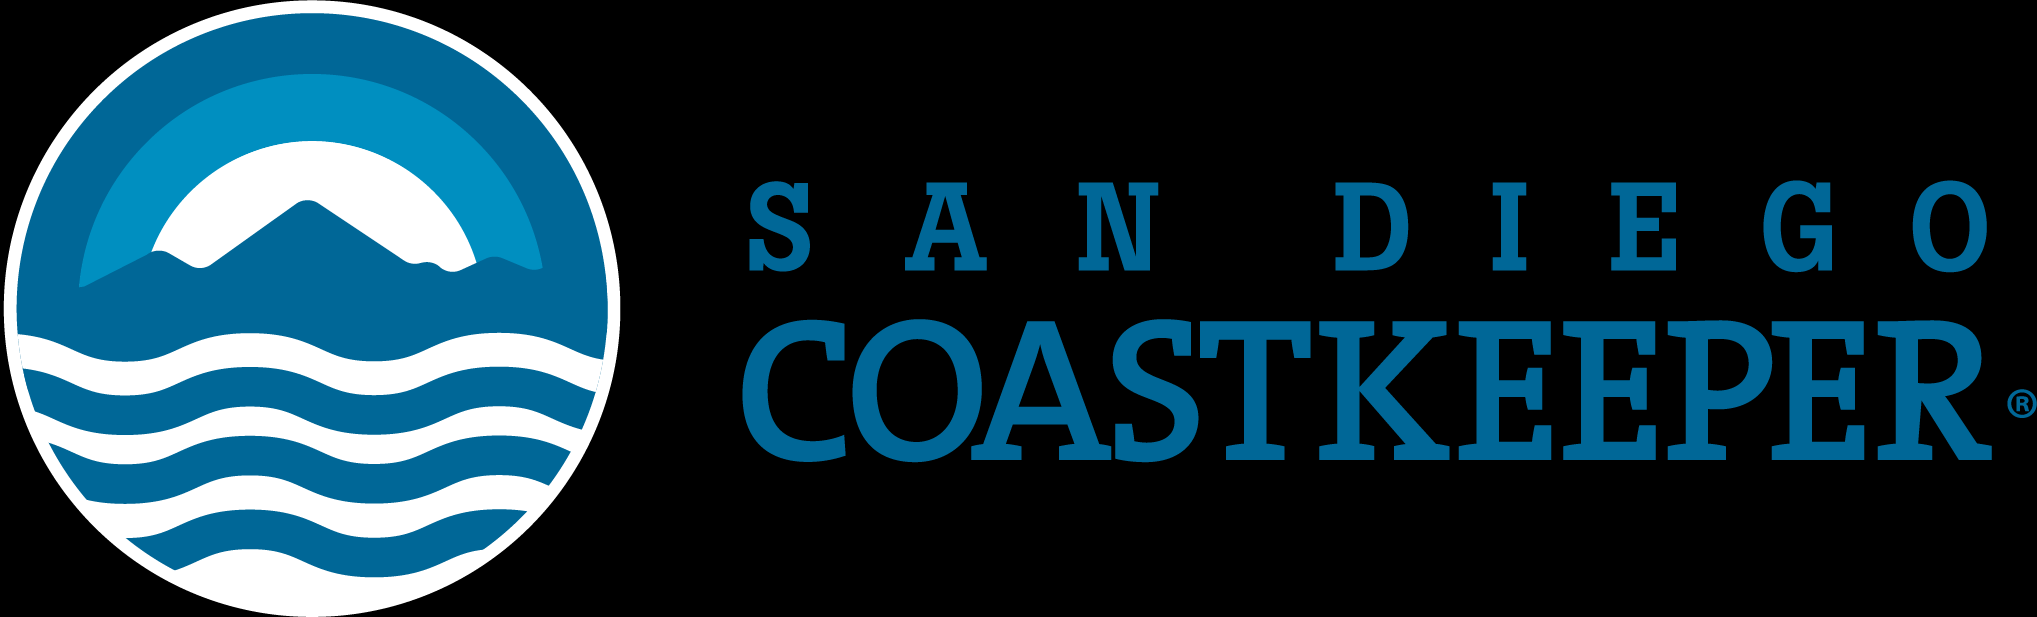 Coastkeeper